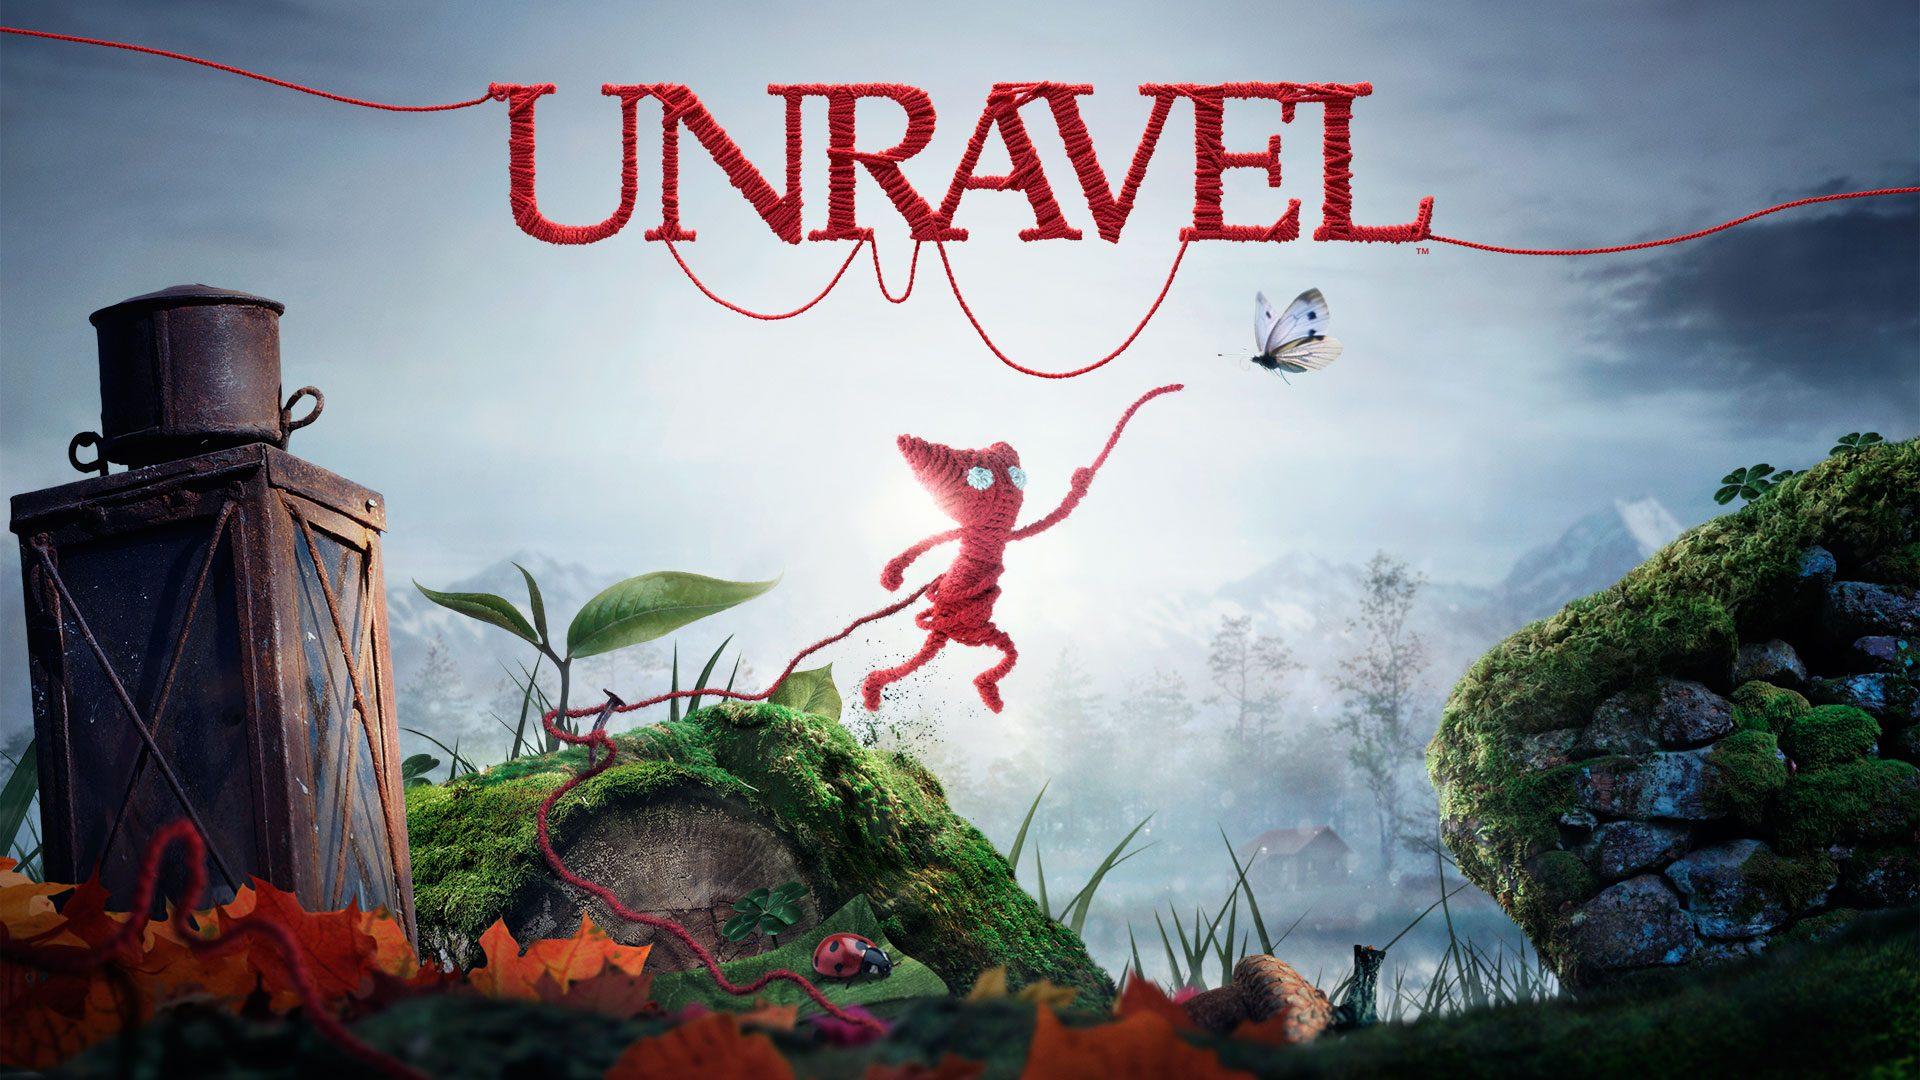 Unravel Intro